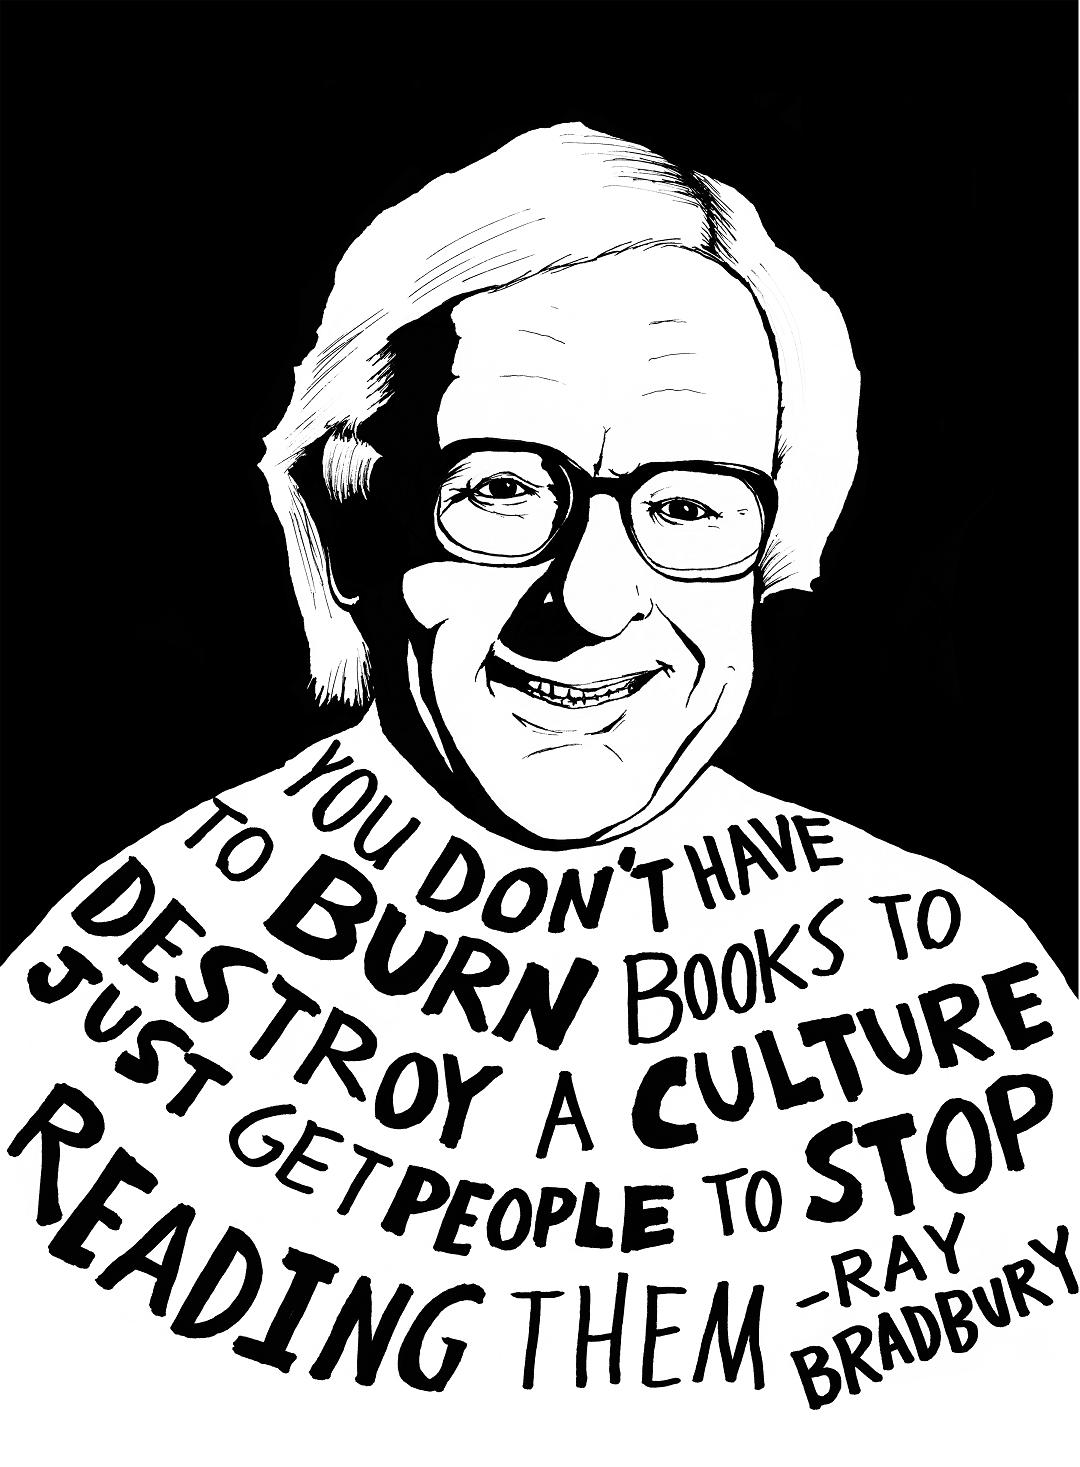 raybradburybooksburnstopreading